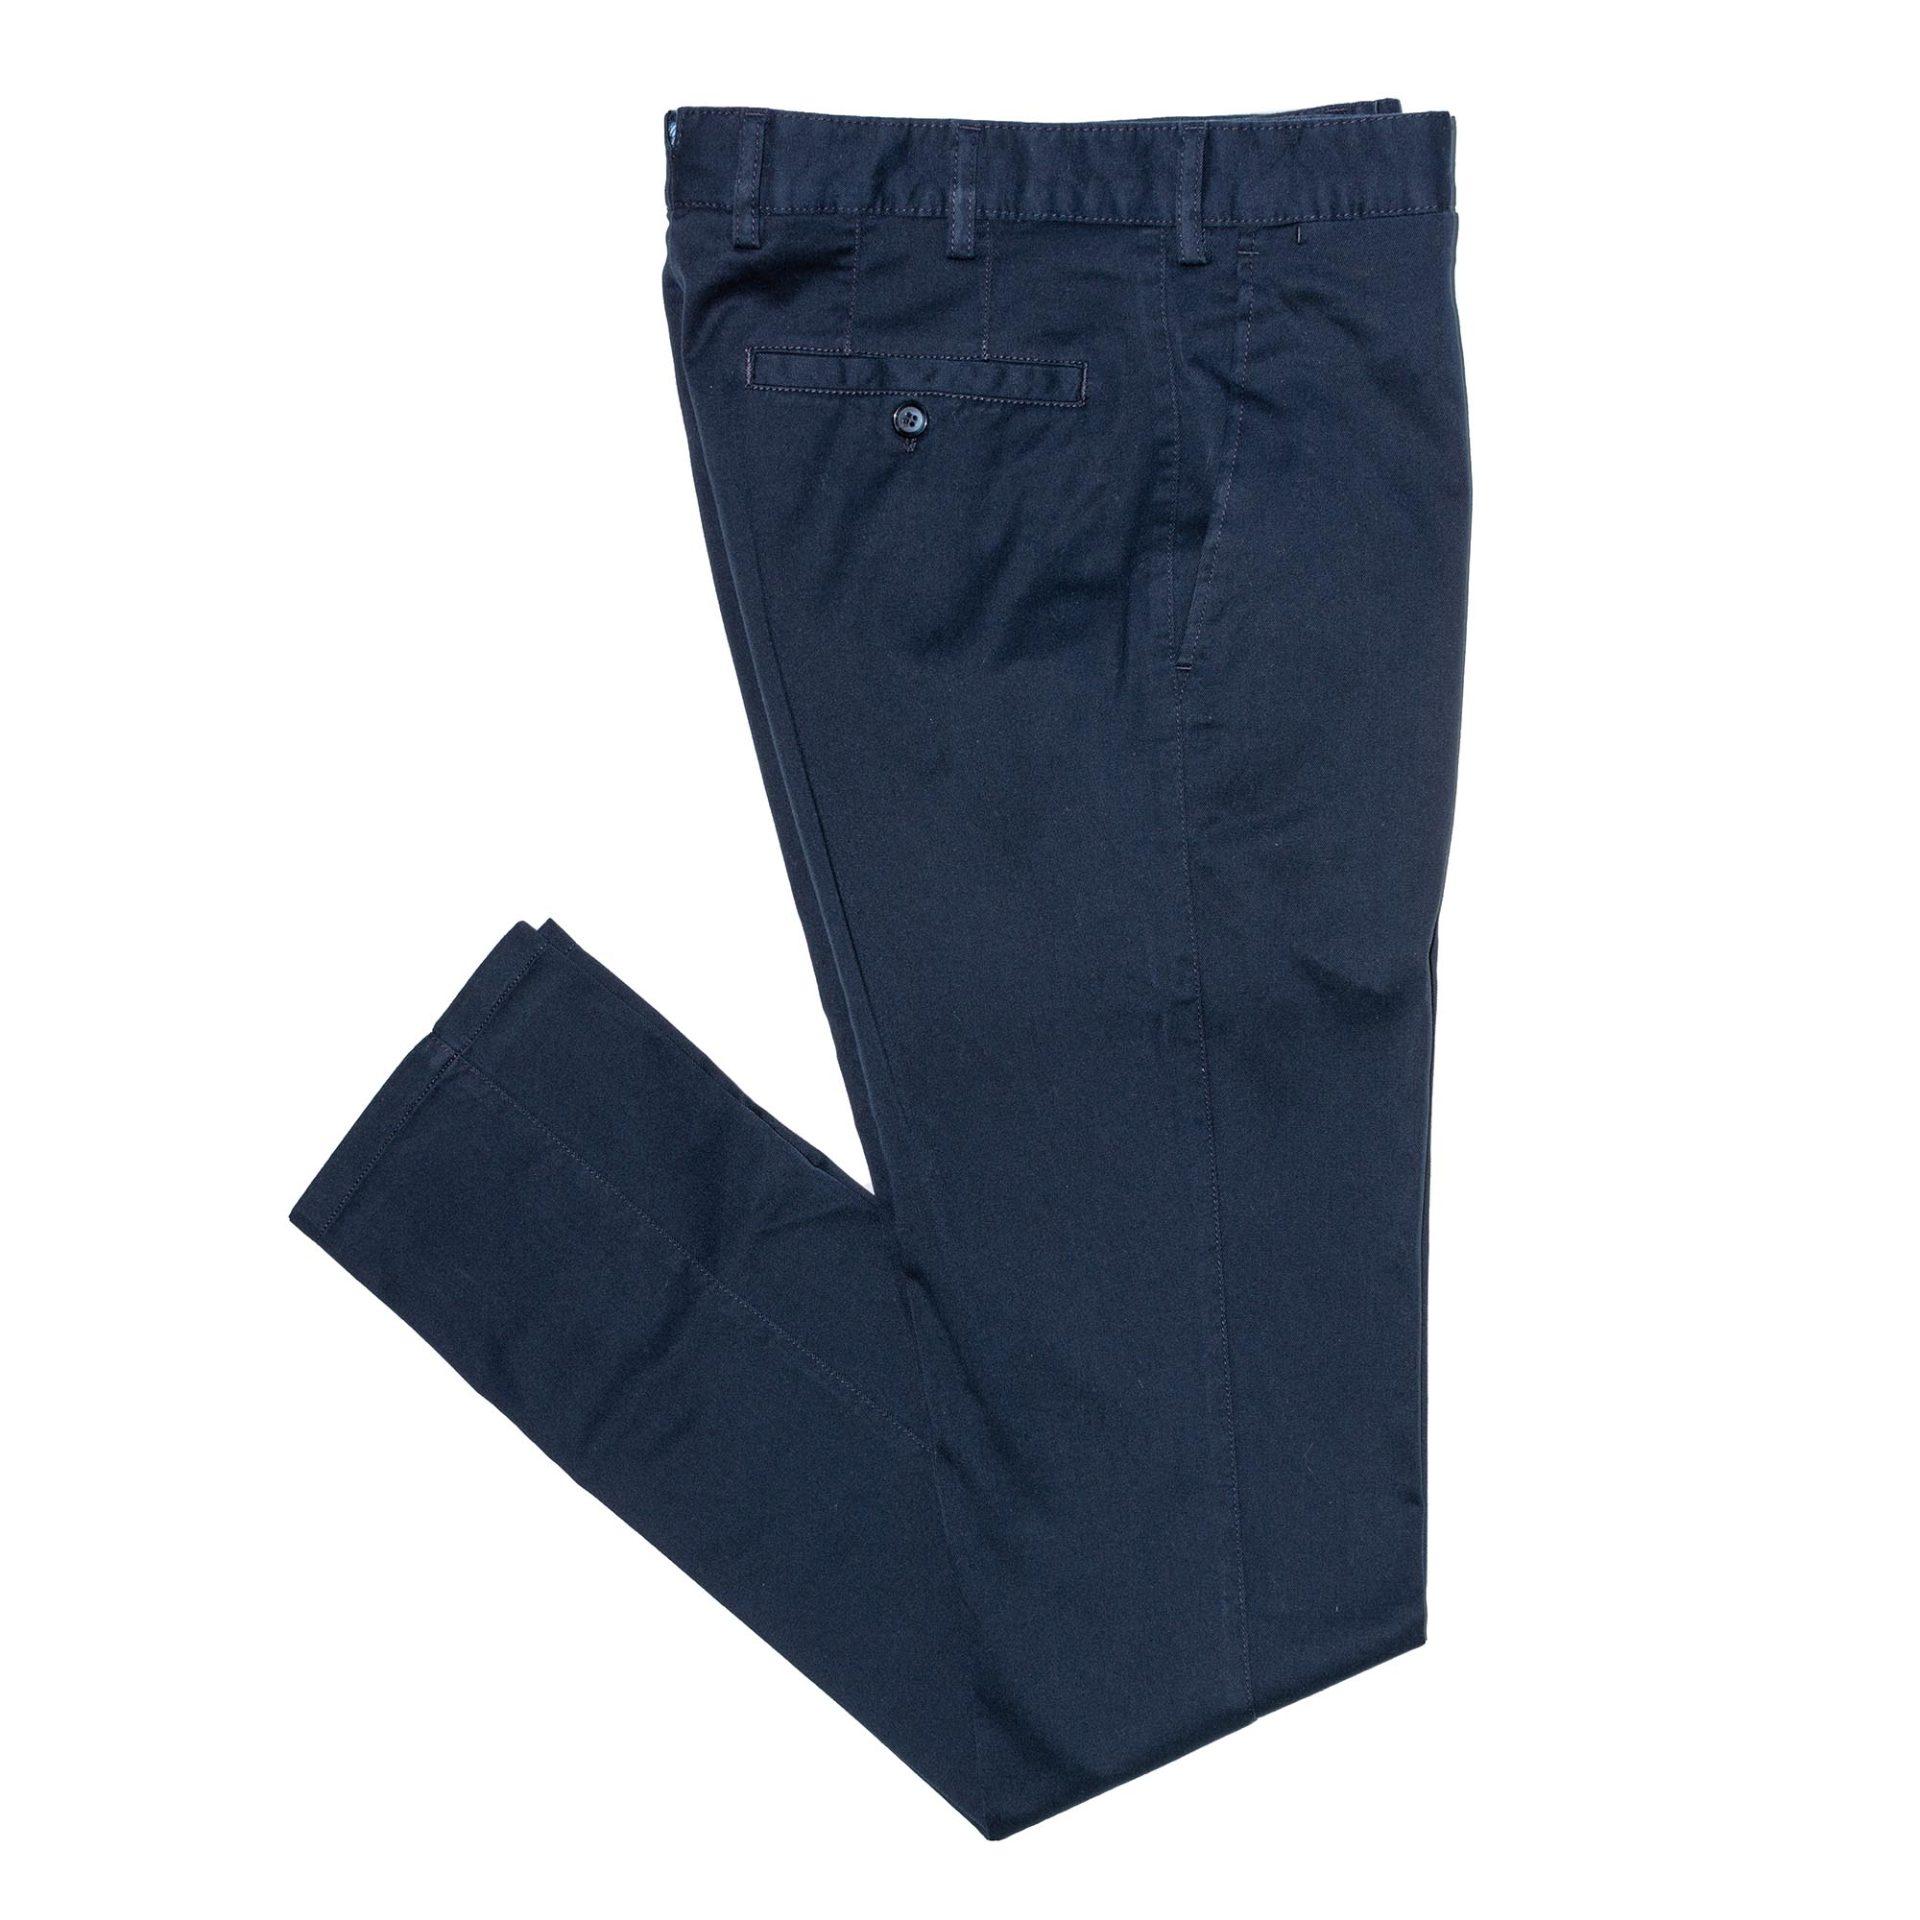 JAGGS-chino-pret-a-porter-essentiels-bleu-marine-regular